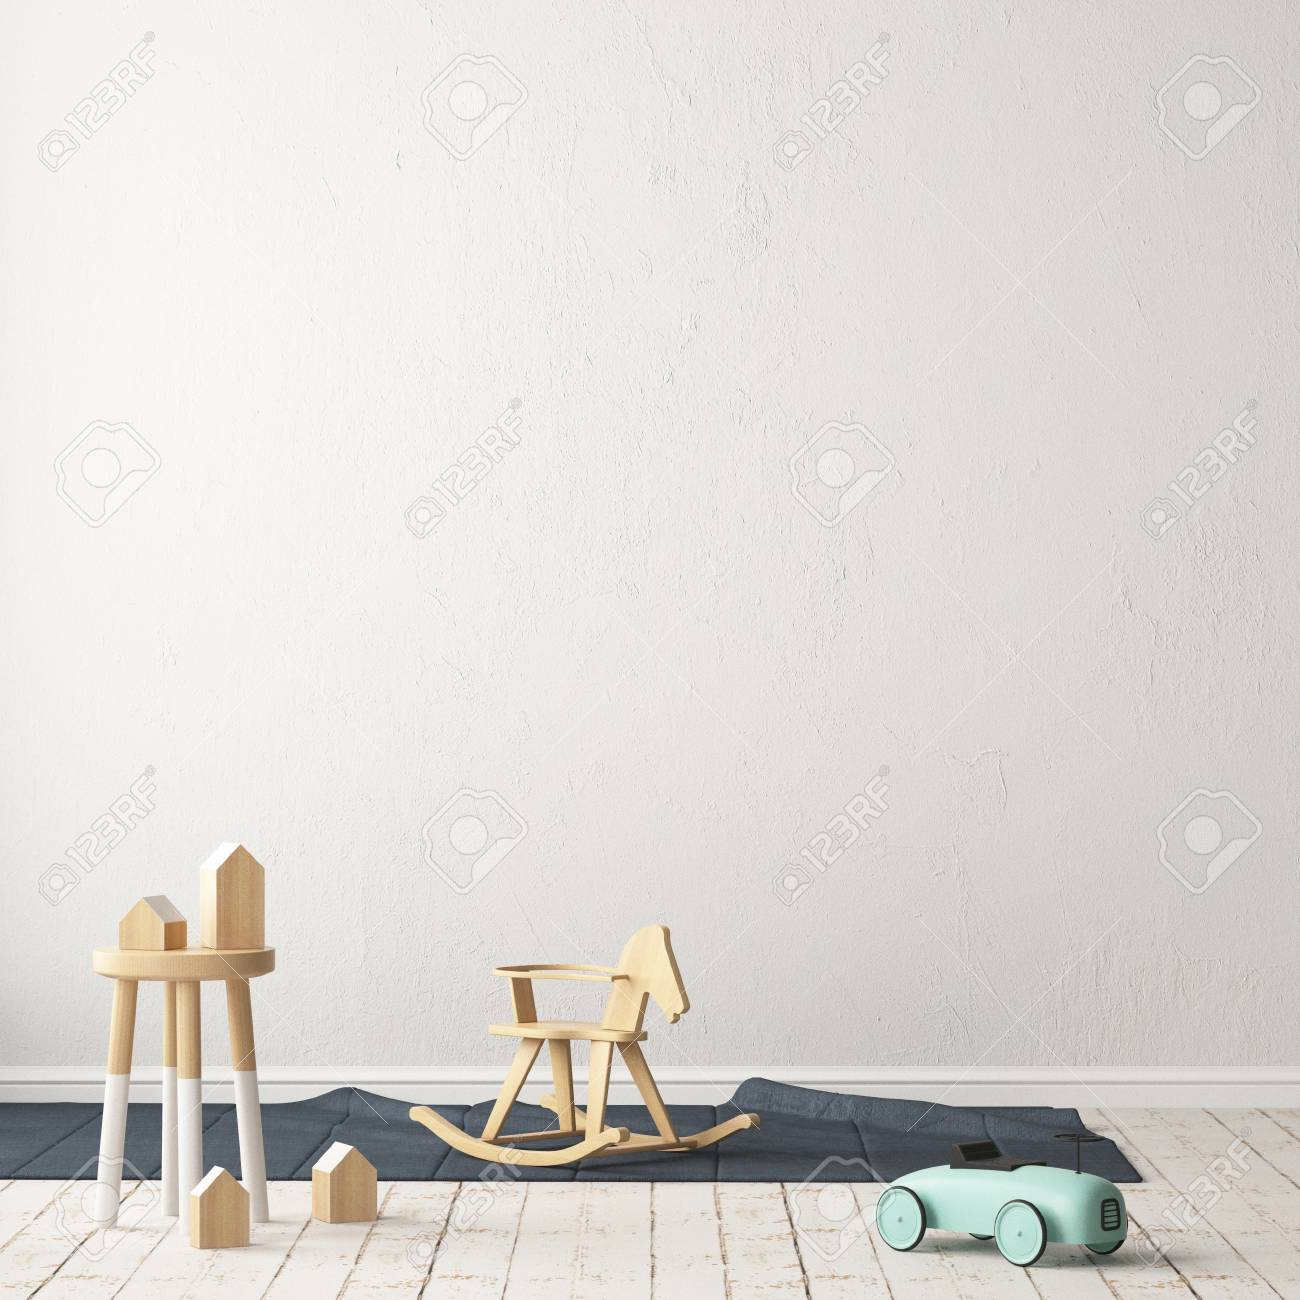 Children's room in Scandinavian style. 3d illustration. - 87129230